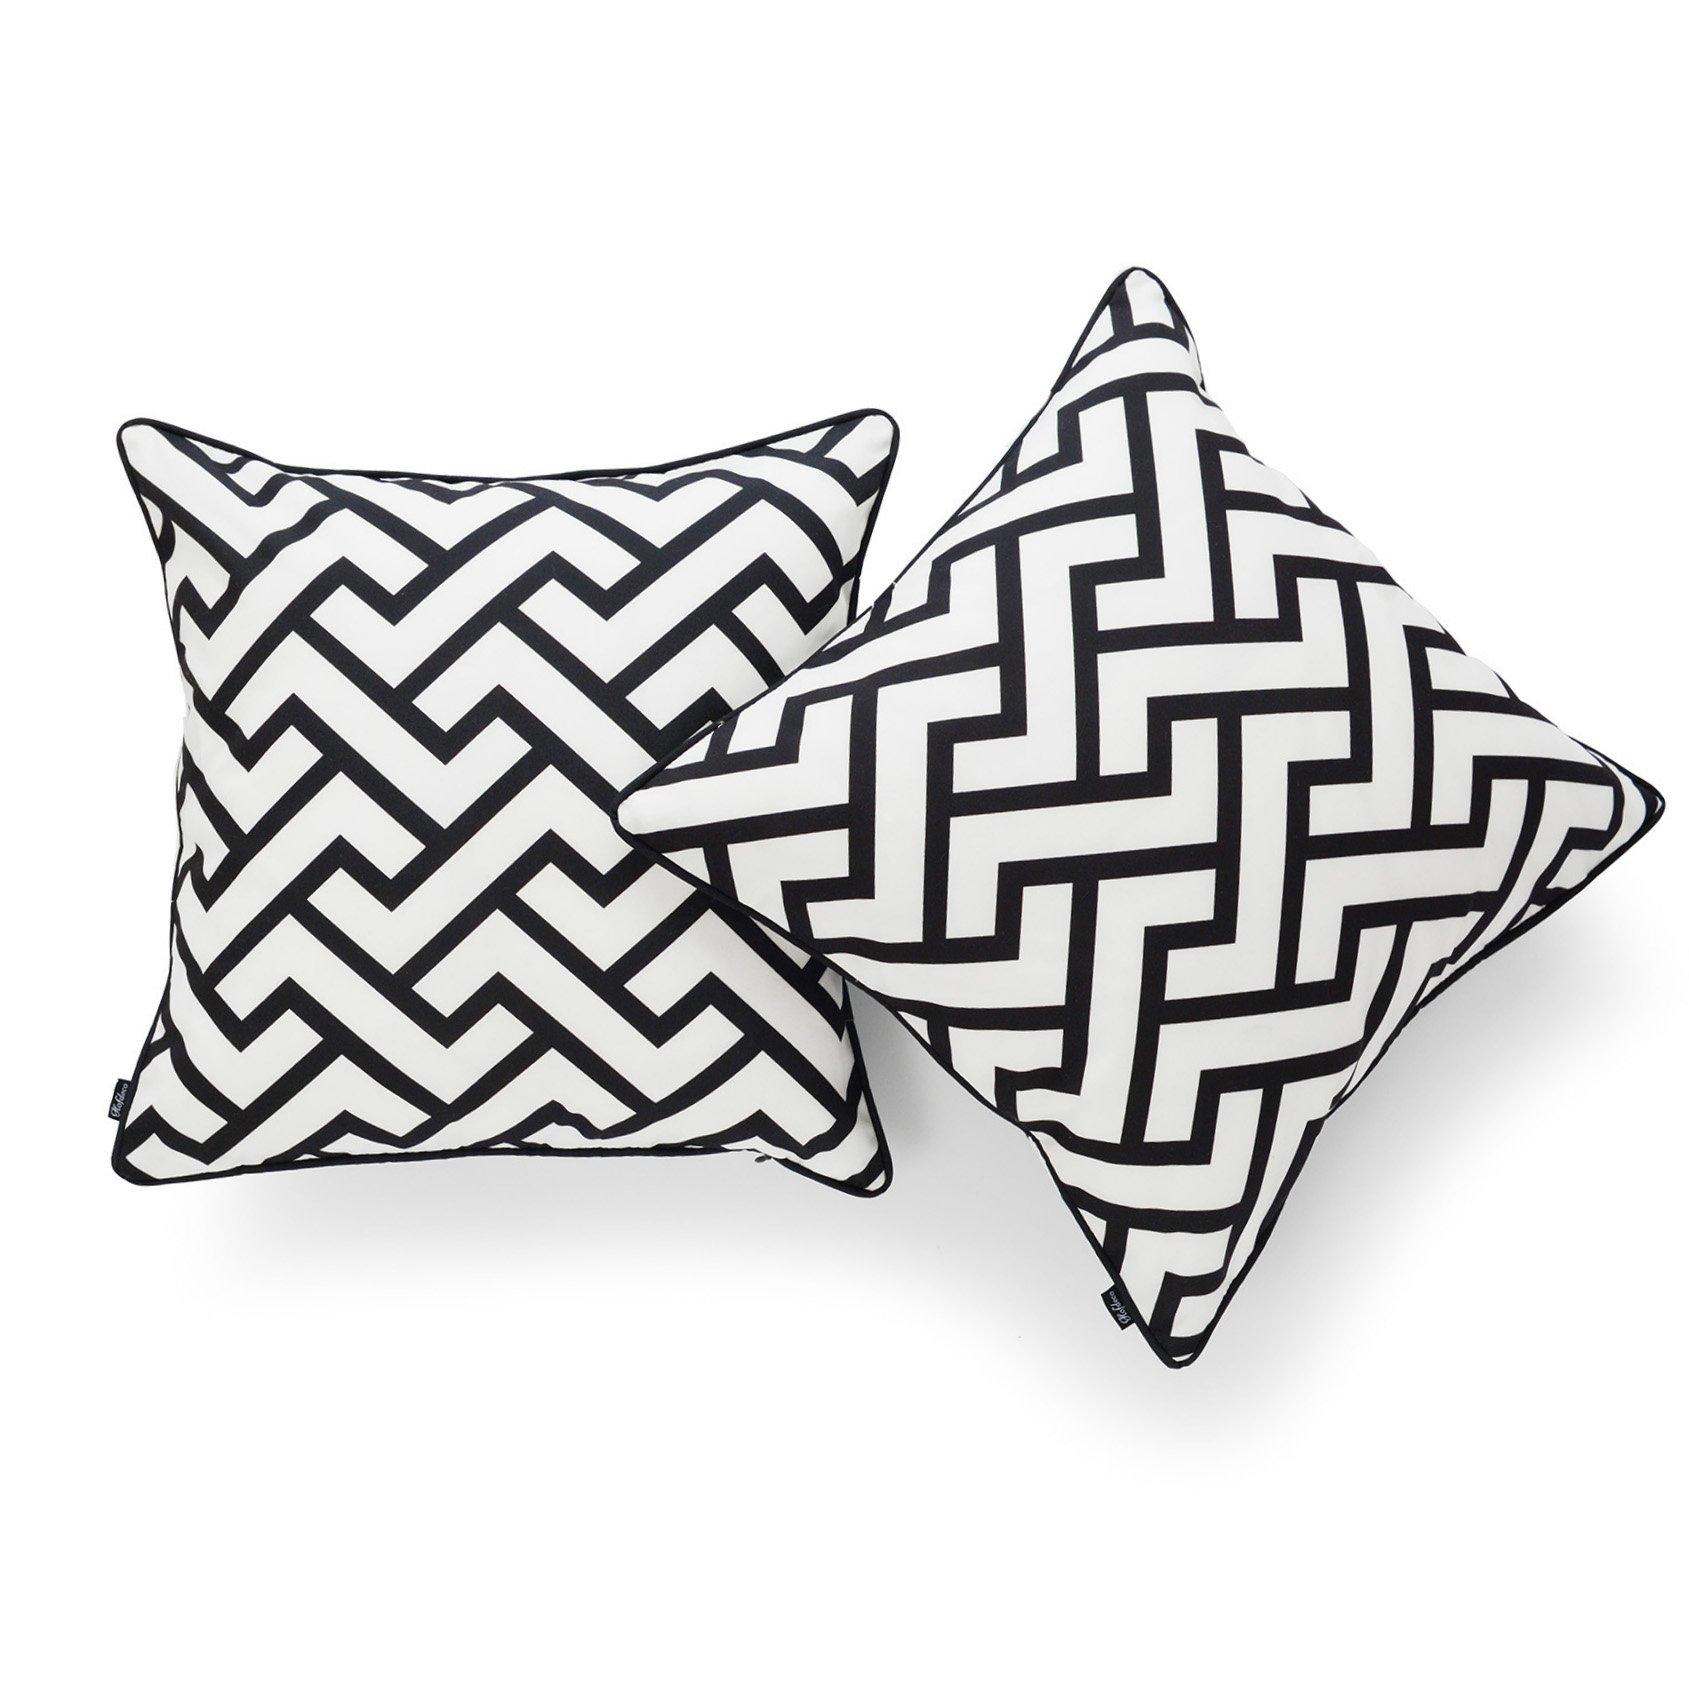 Hofdeco Decorative Throw Pillow Cover INDOOR OUTDOOR WATER RESISTANT Canvas Modern Black City Maze 18''x18'' Set of 2